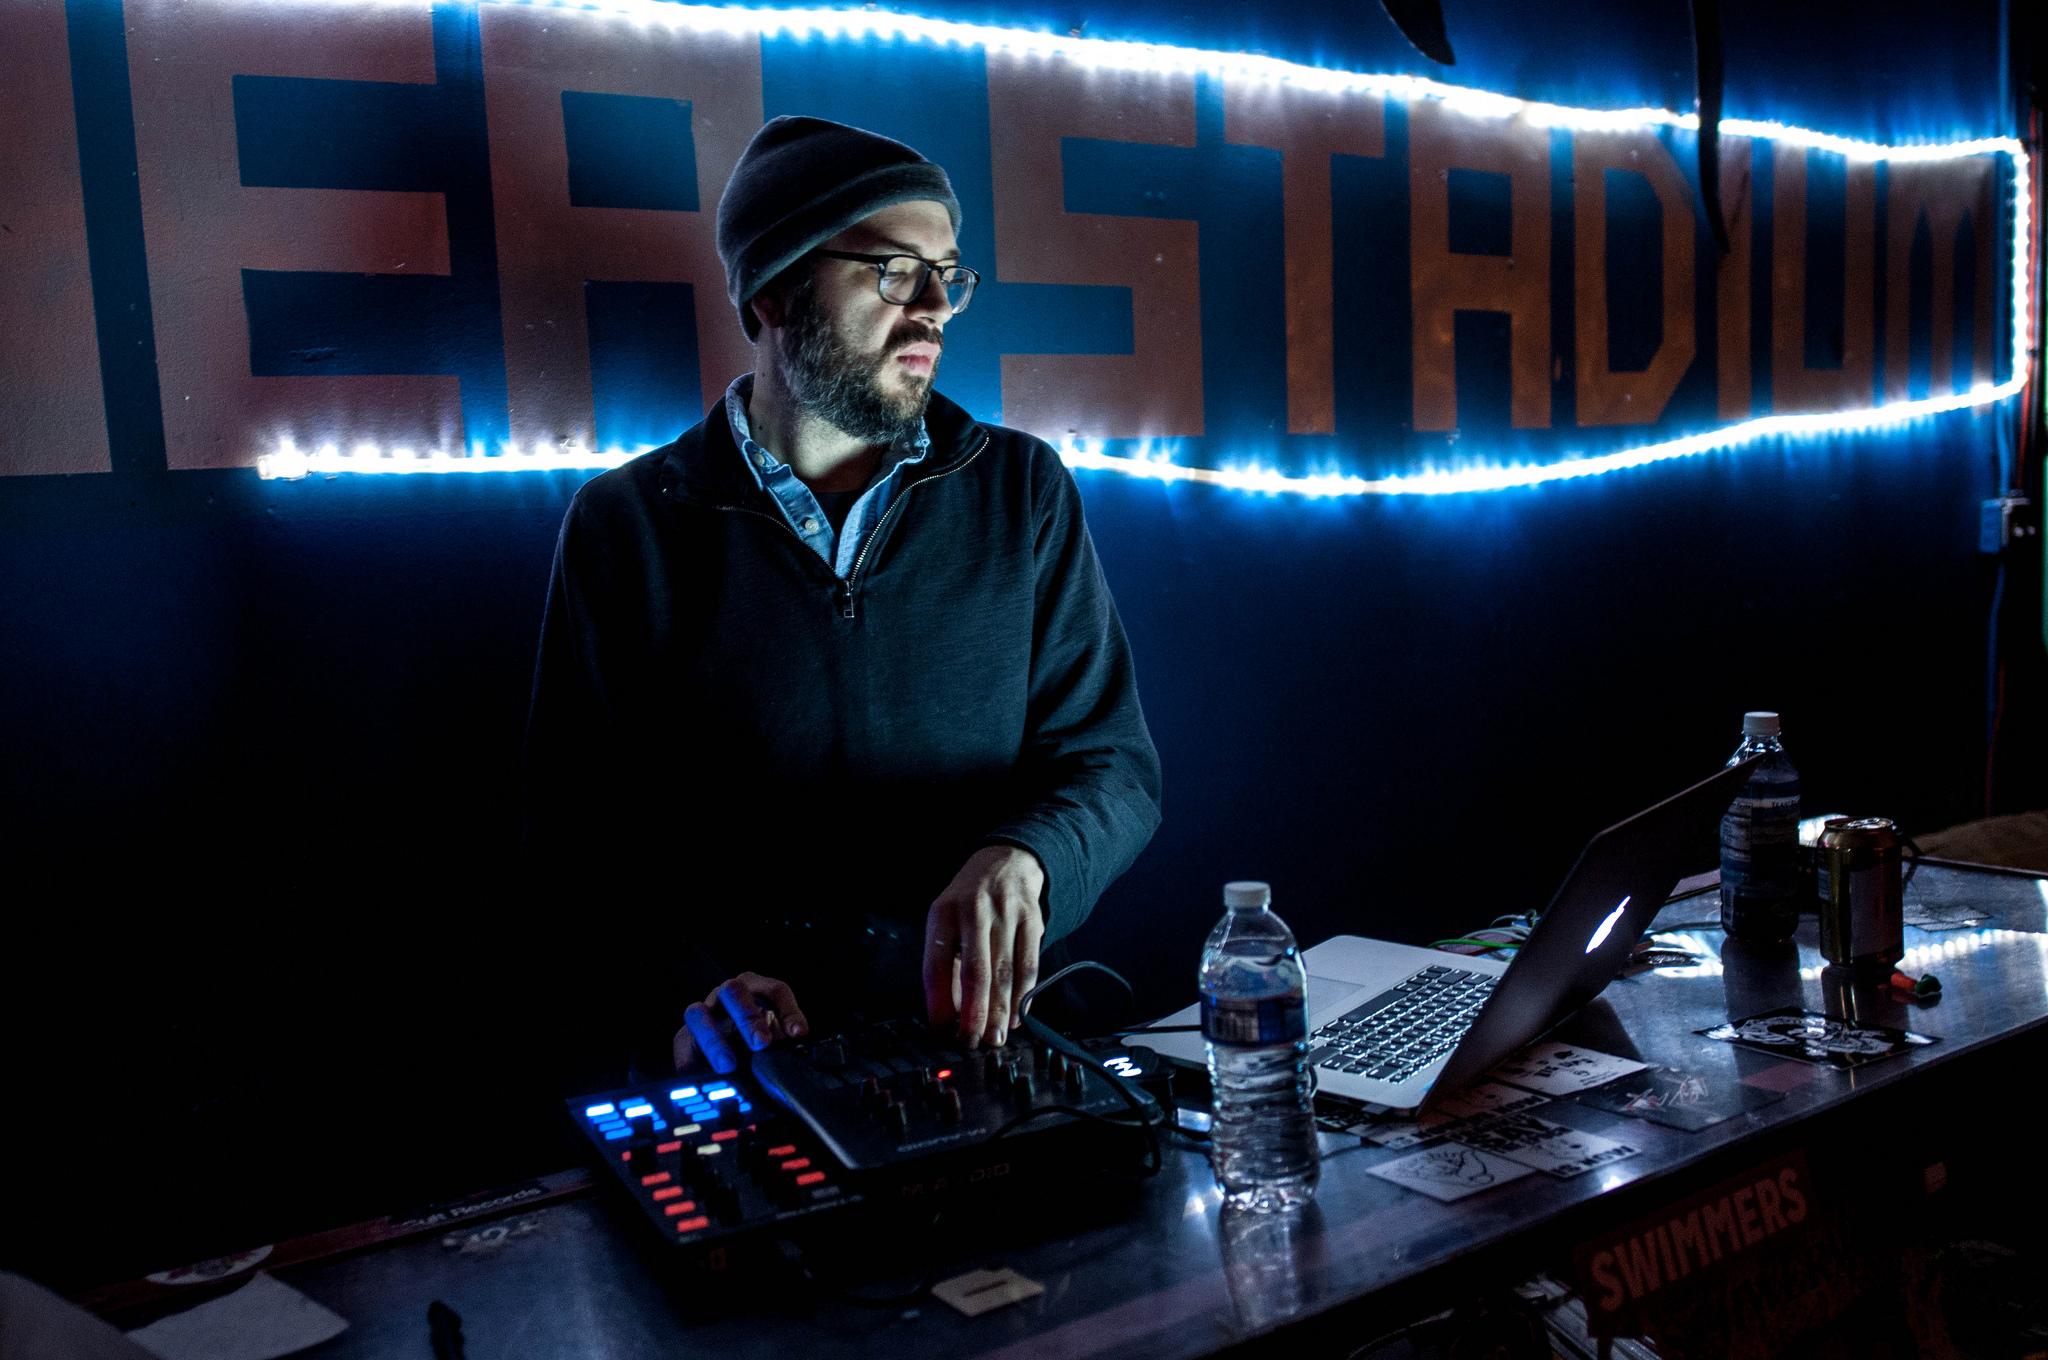 DJ Eric Phipps at Shea Stadium on January 23, 2015